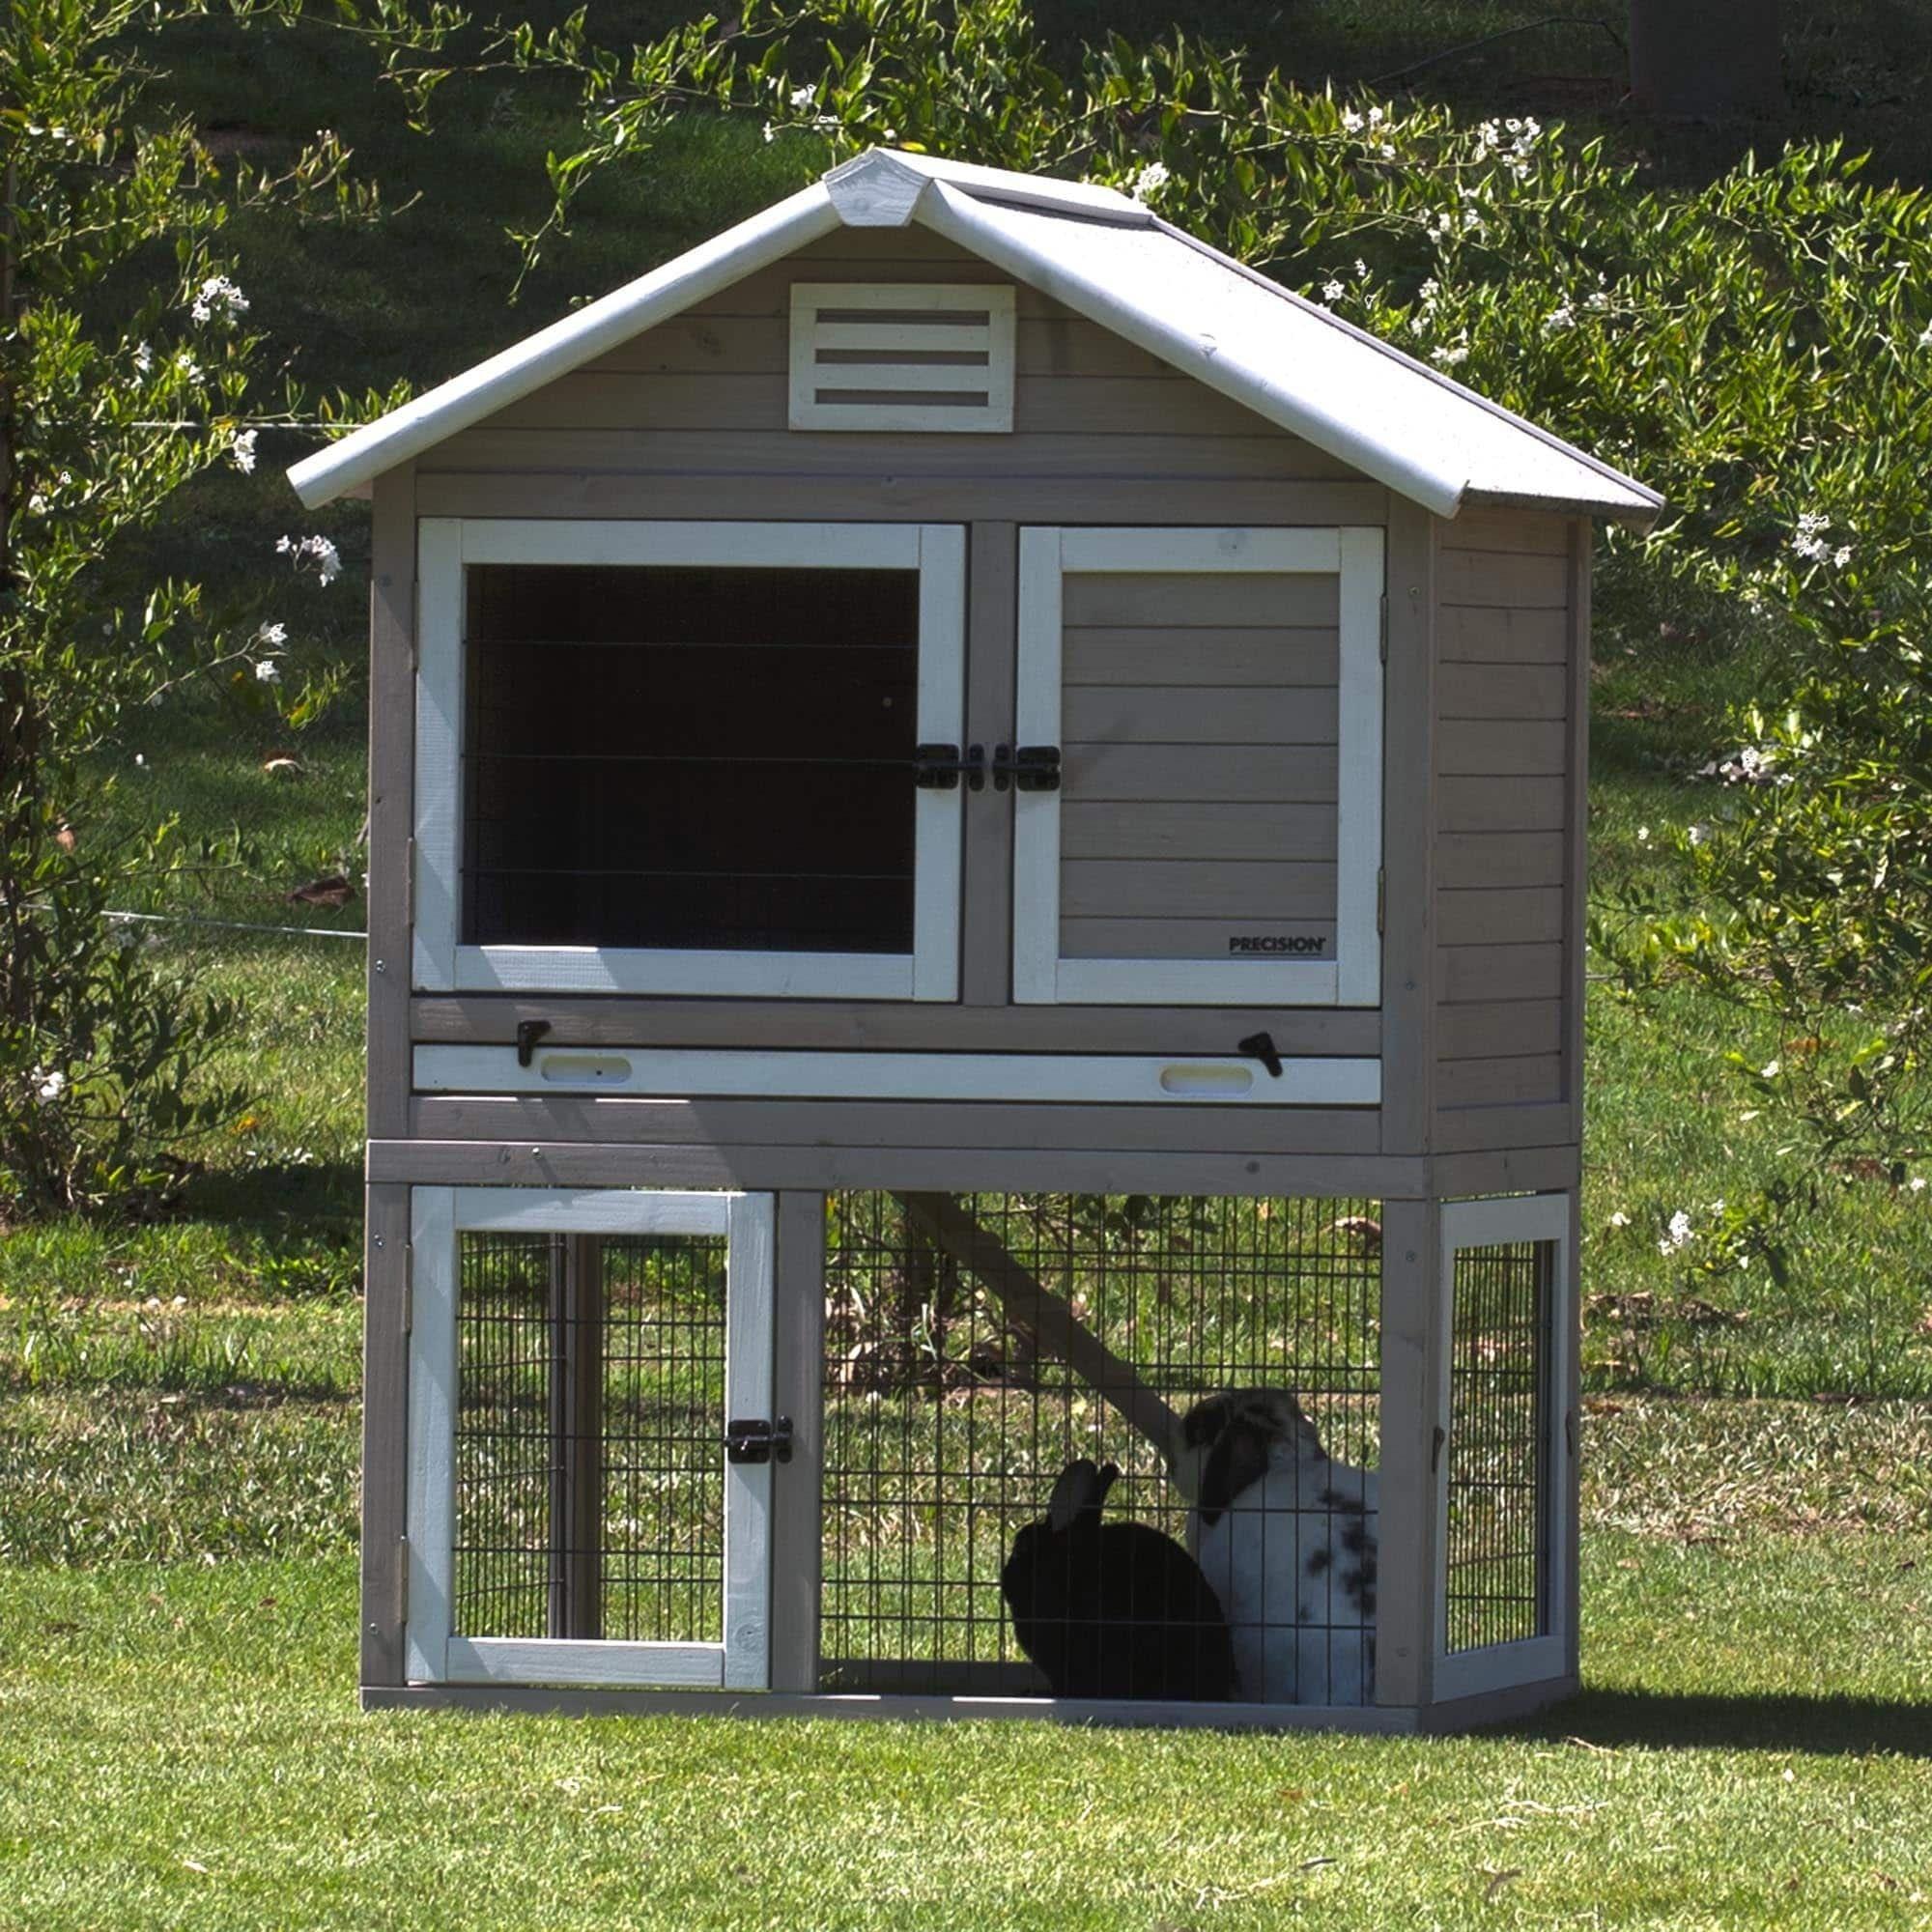 Precision Pet Rabbit Playhouse